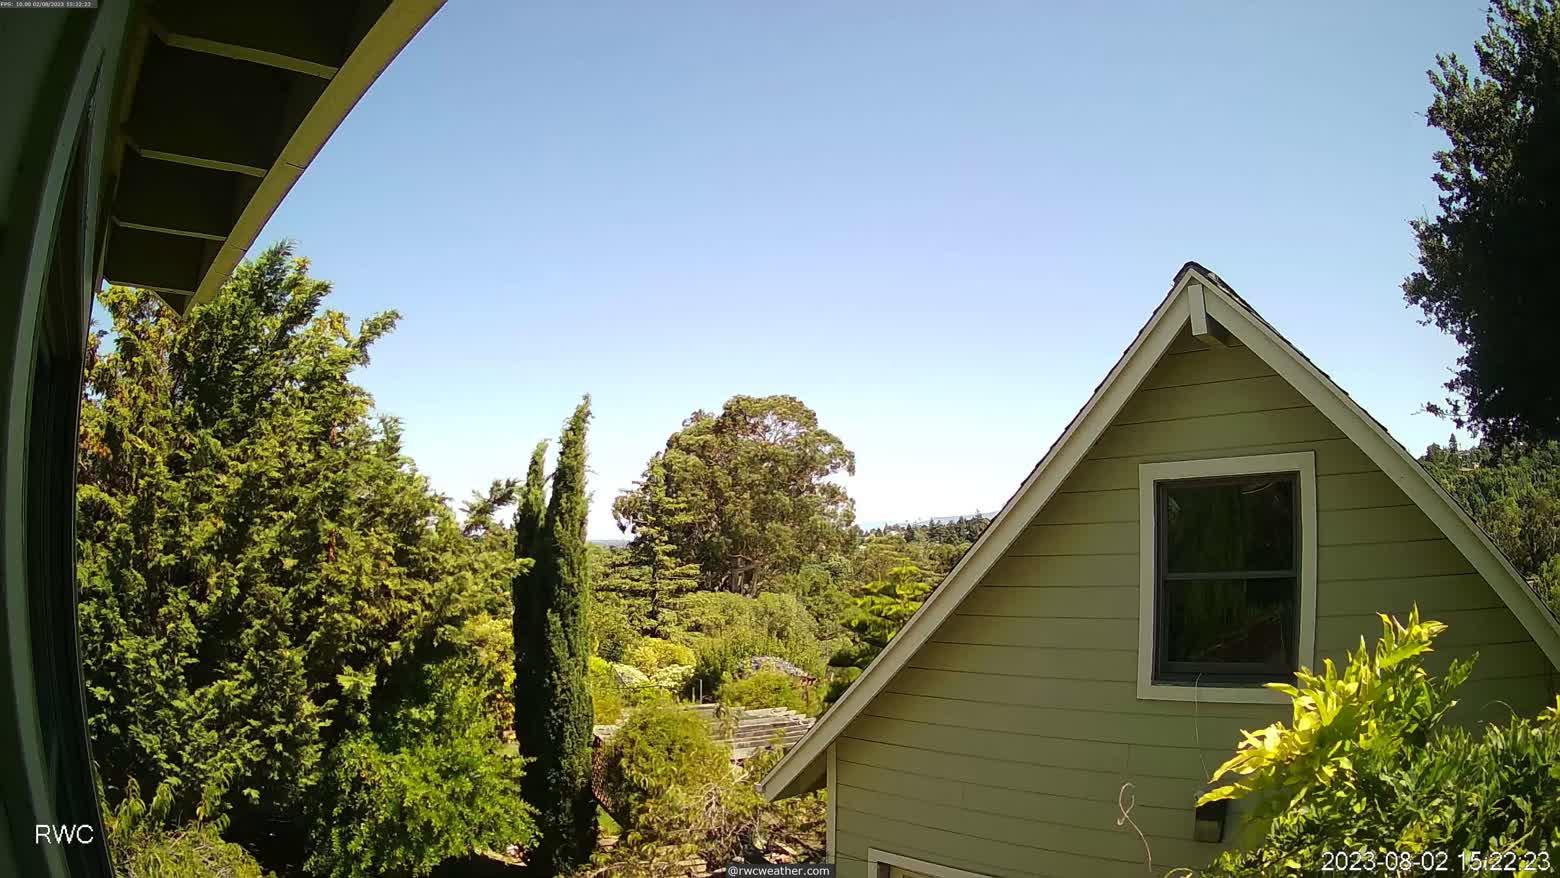 rwc weather cam